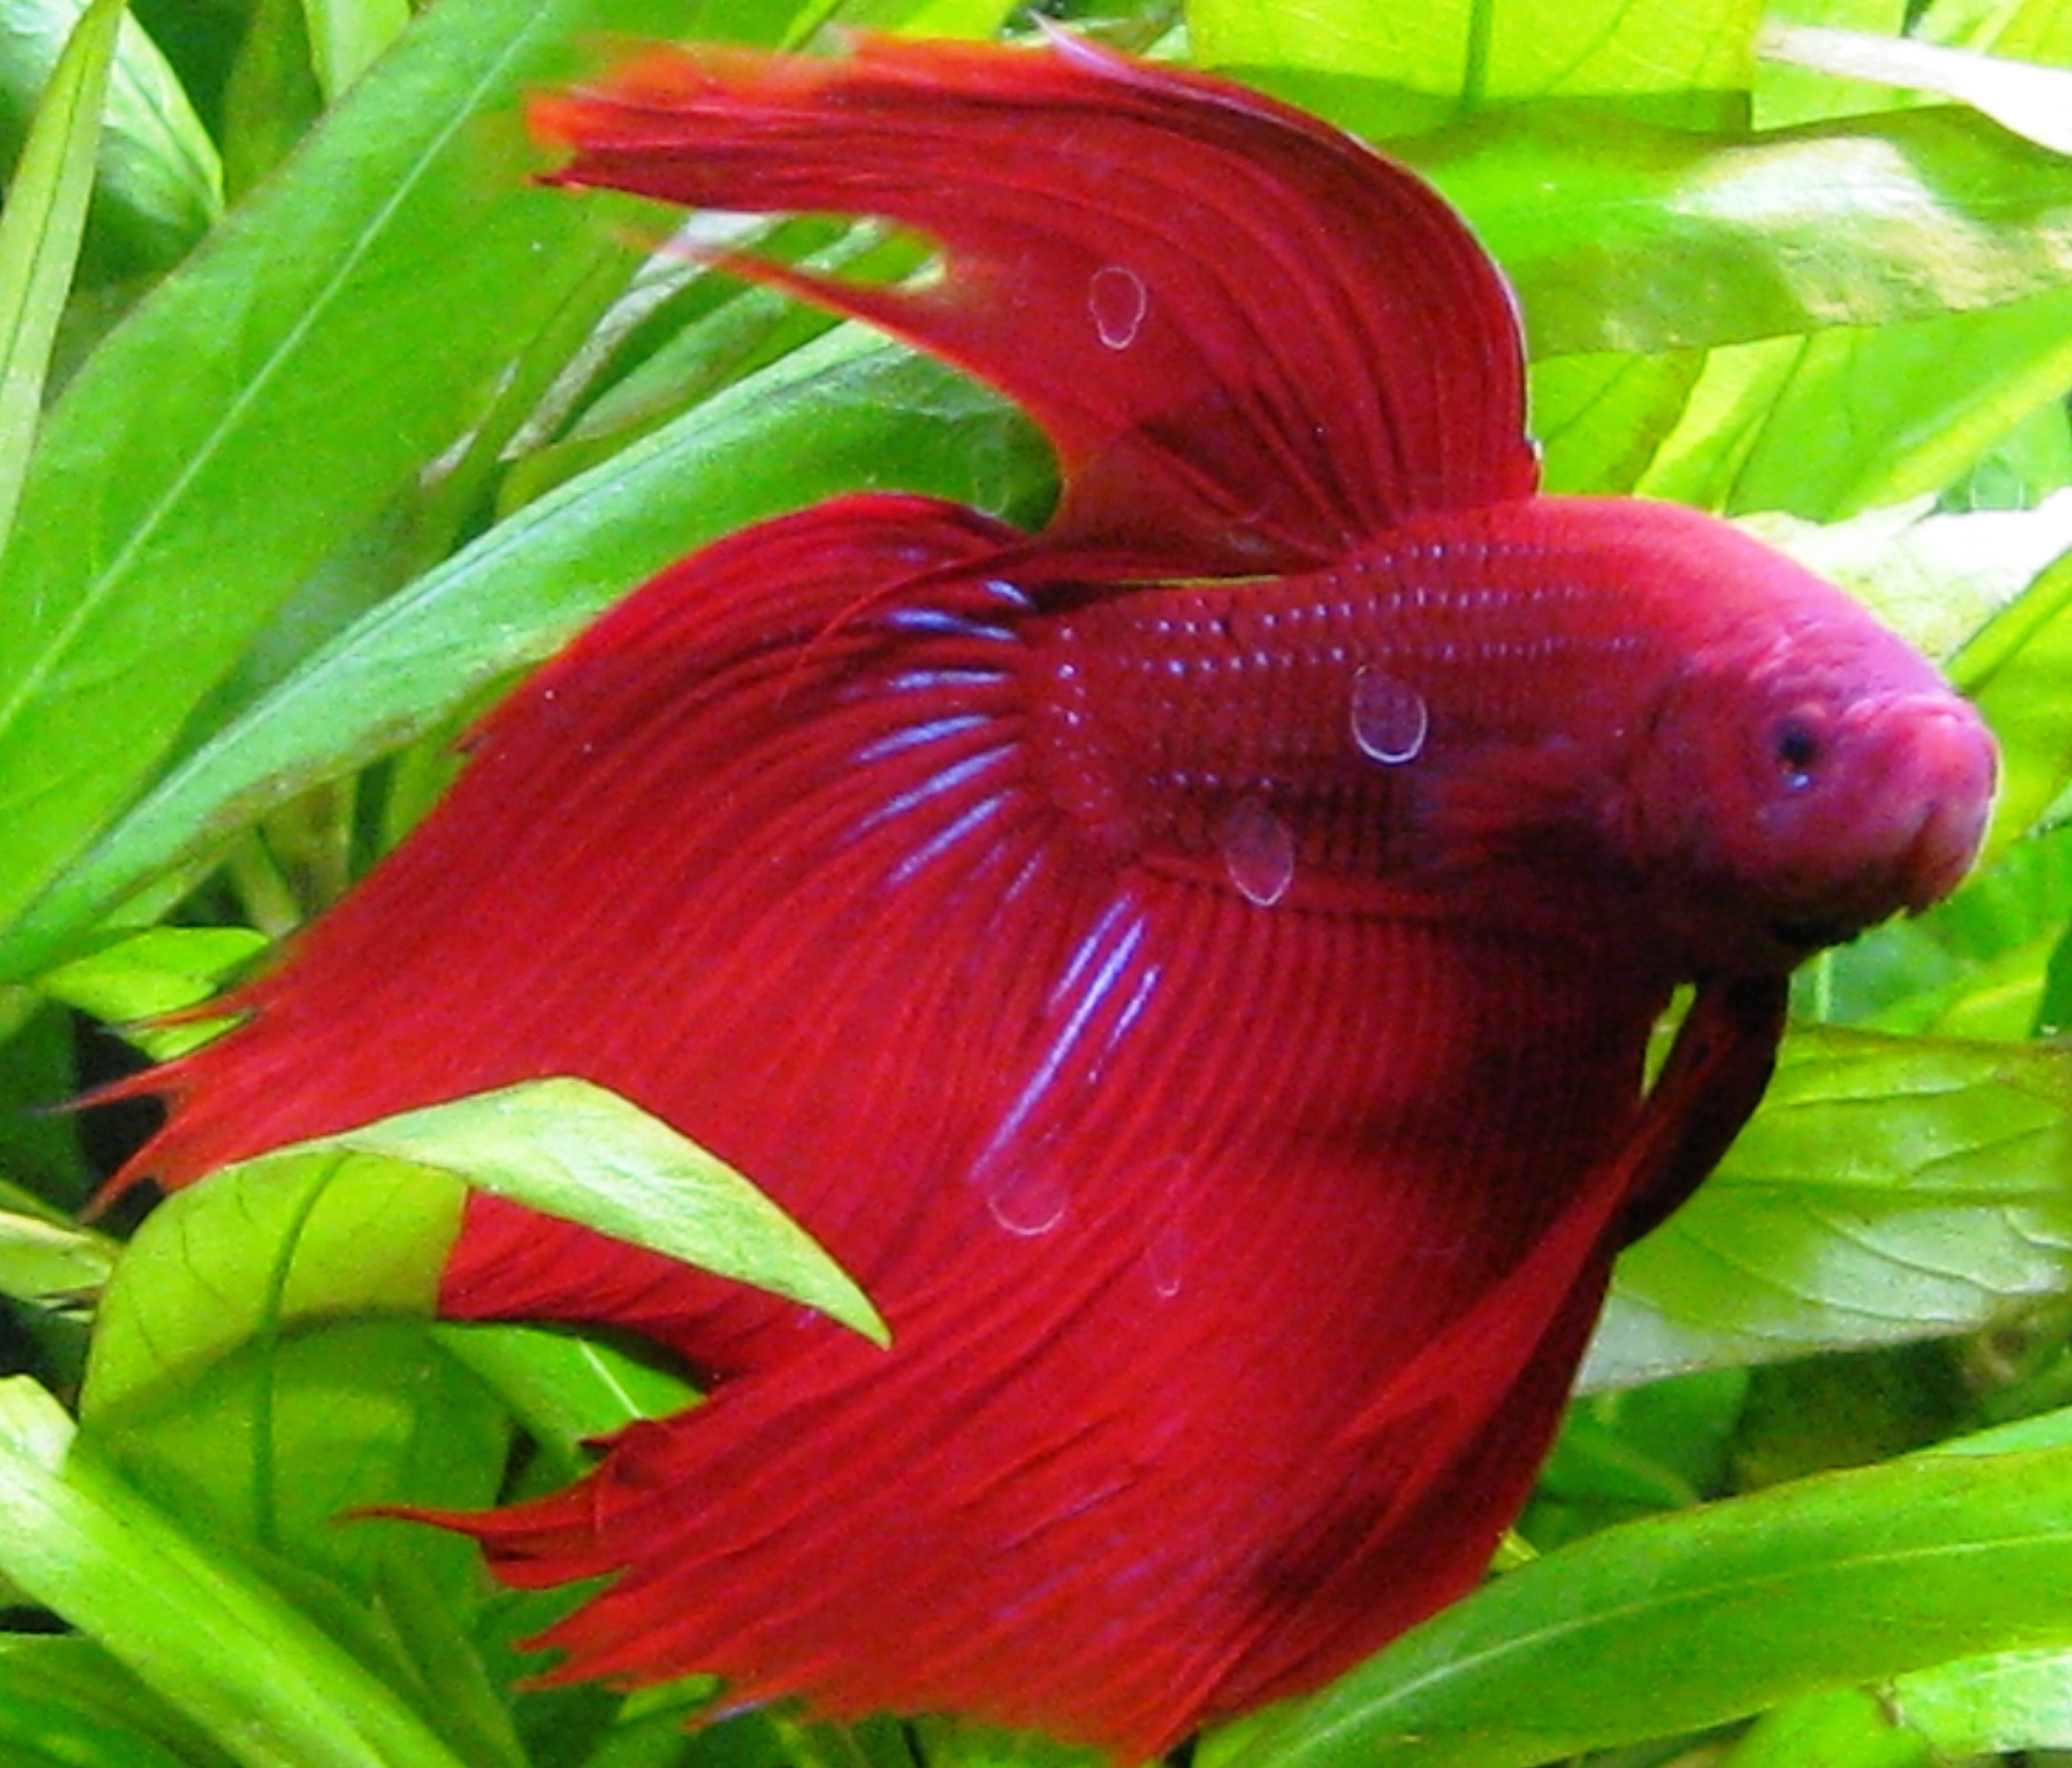 Fish Animal   Freshwater Fish Wallpaper – HD Wallpapers